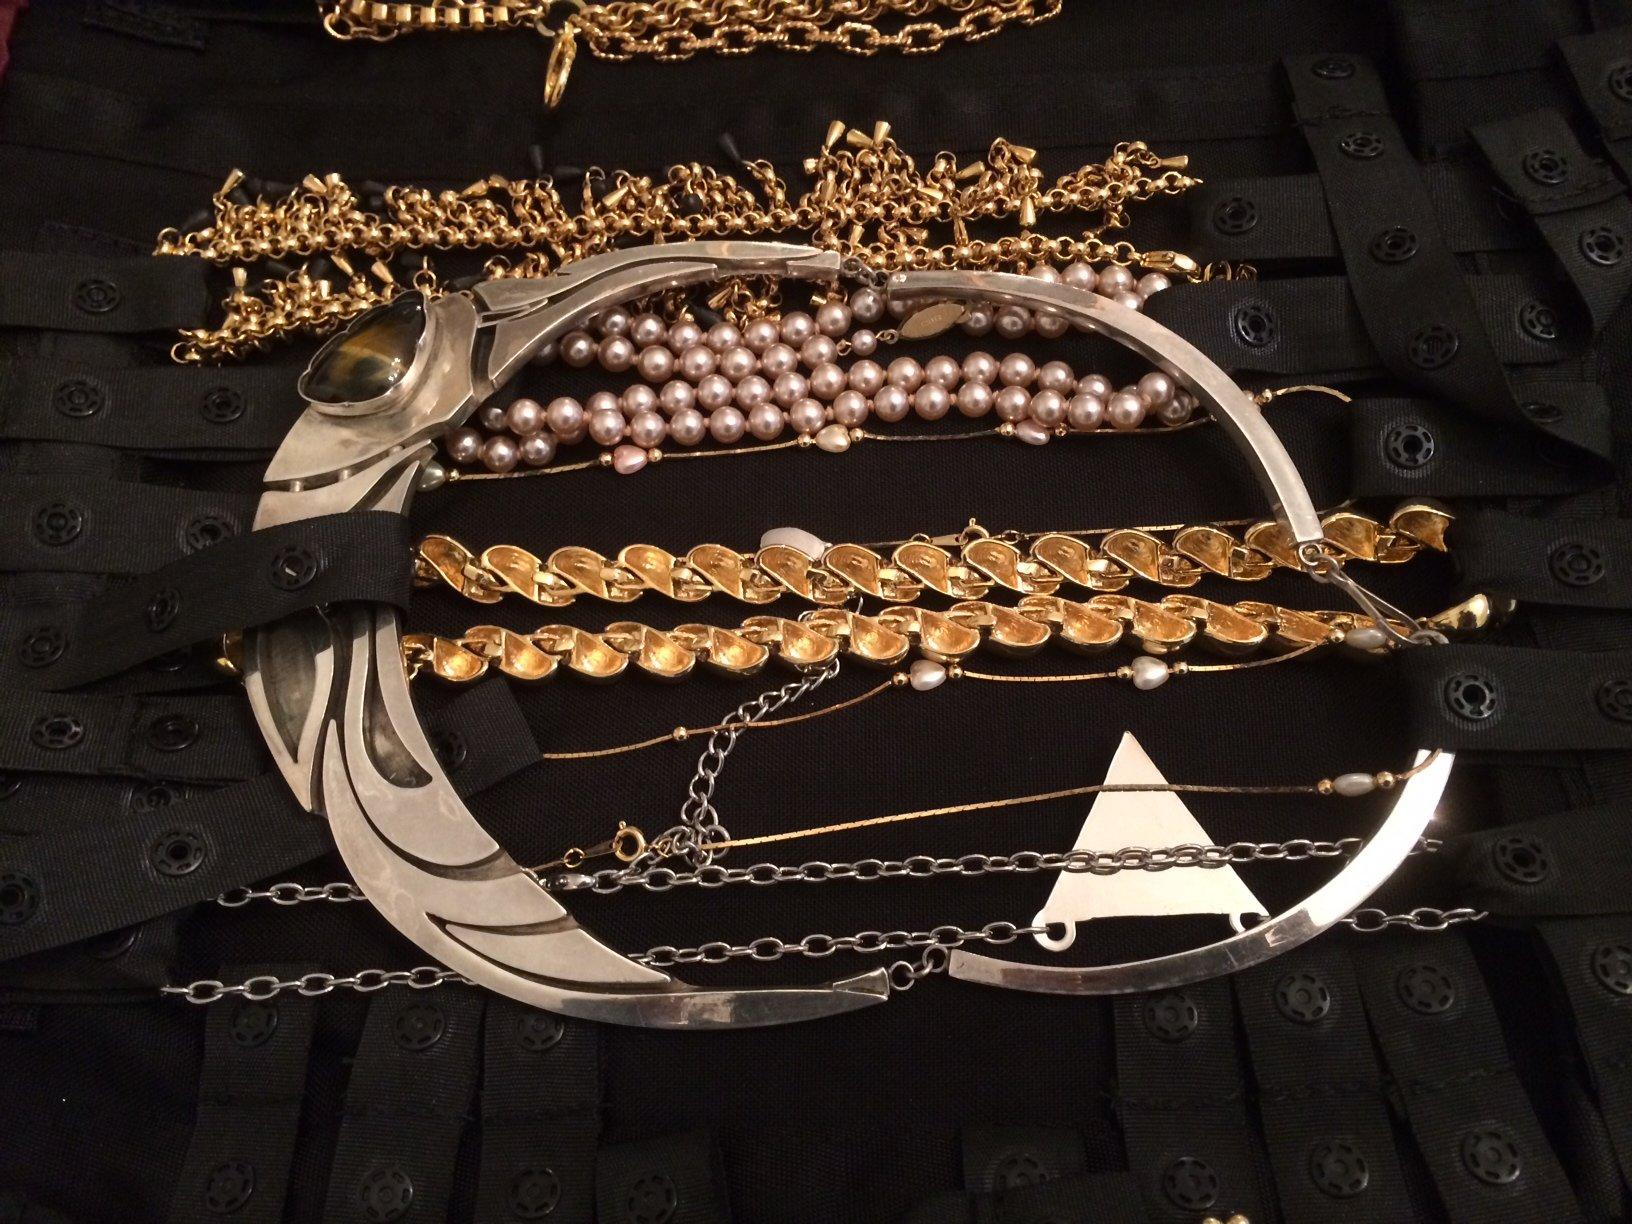 Folding Foldable Storage Case Jewelry Organizer by Jewelry File Portfolio 21 Century Holds over 117 pieces Securely by JewelryFilePortfolio organizer (Image #6)